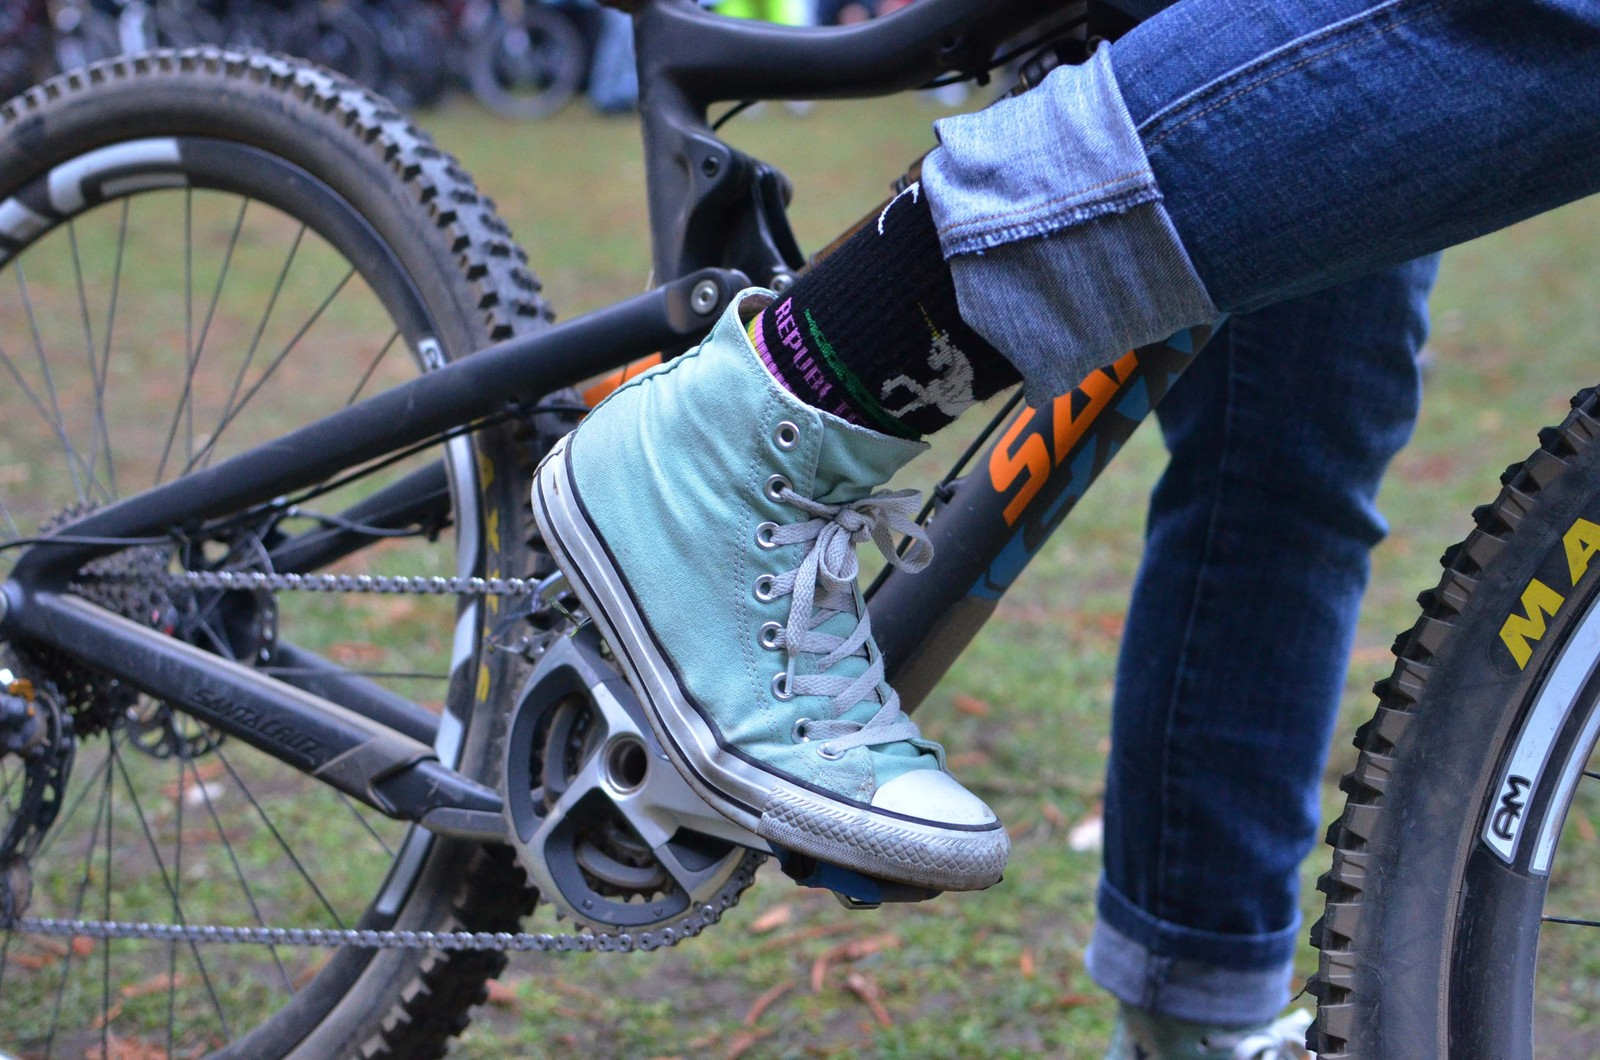 Kathy Pruitt's Santa Cruz Bronson - PIT BITS - 2013 Santa Cruz Super Enduro - Mountain Biking Pictures - Vital MTB